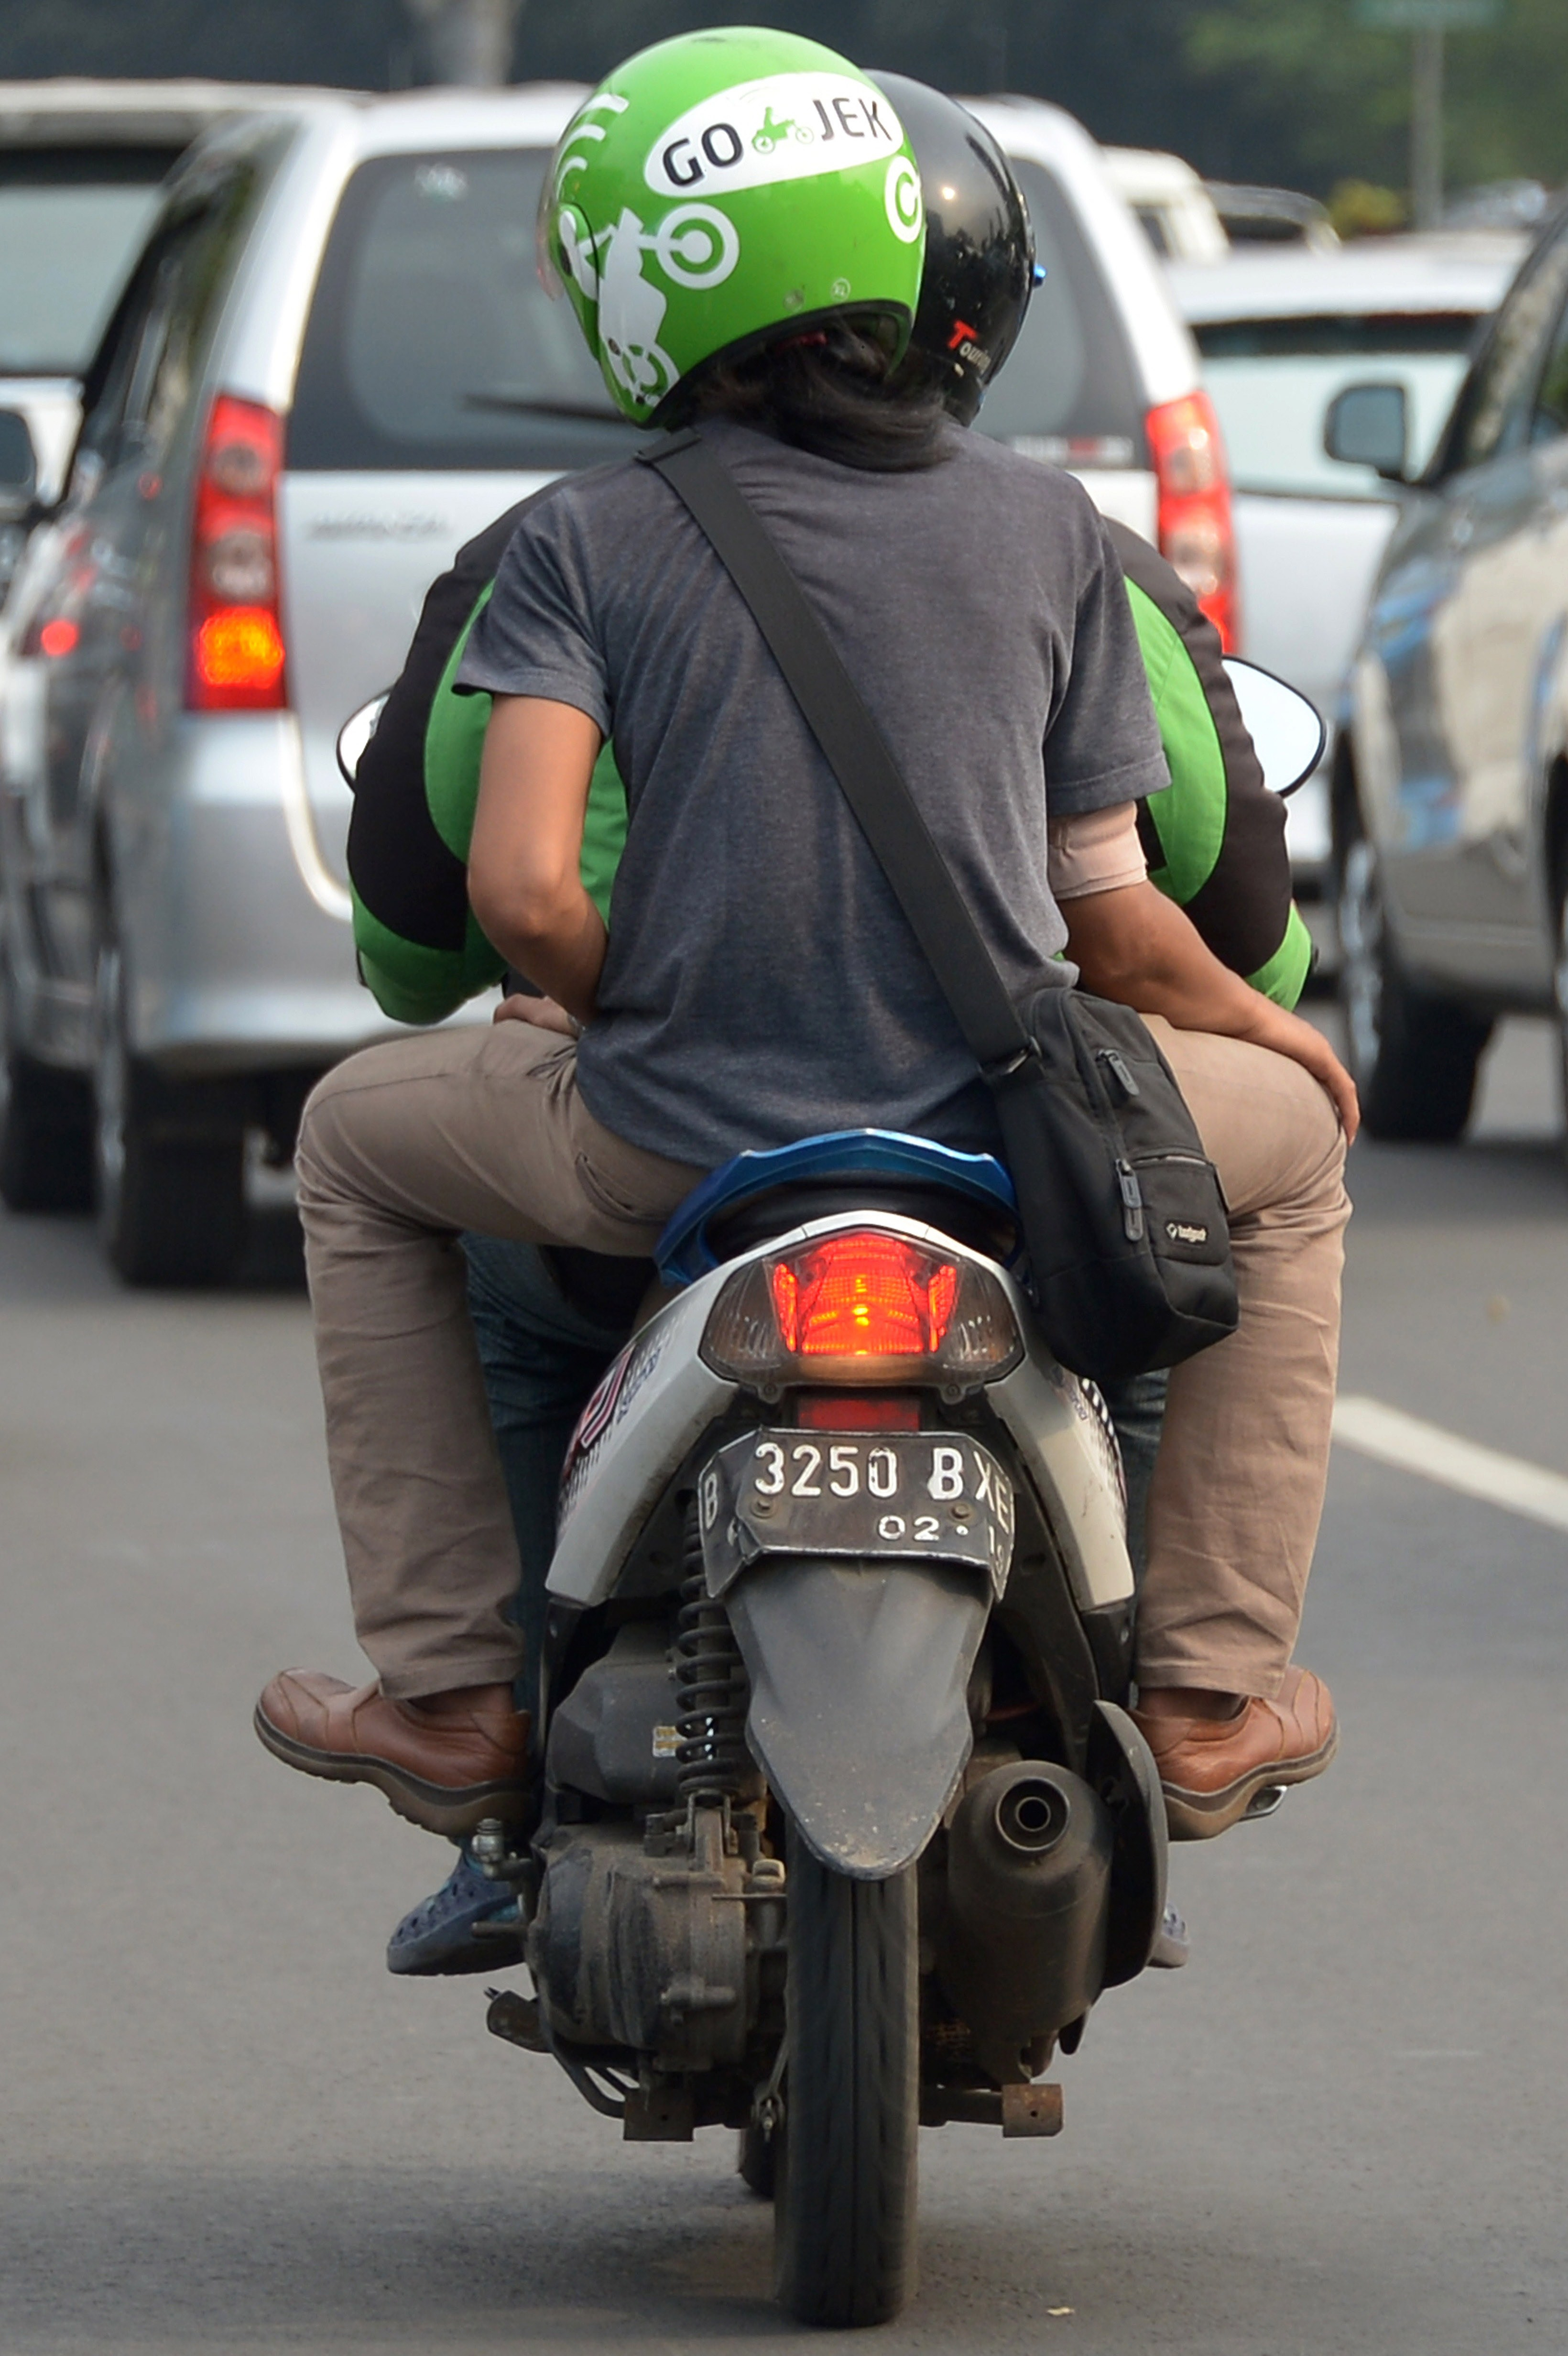 INDONESIA-TRANSPORT-TRAFFIC-INTERNET